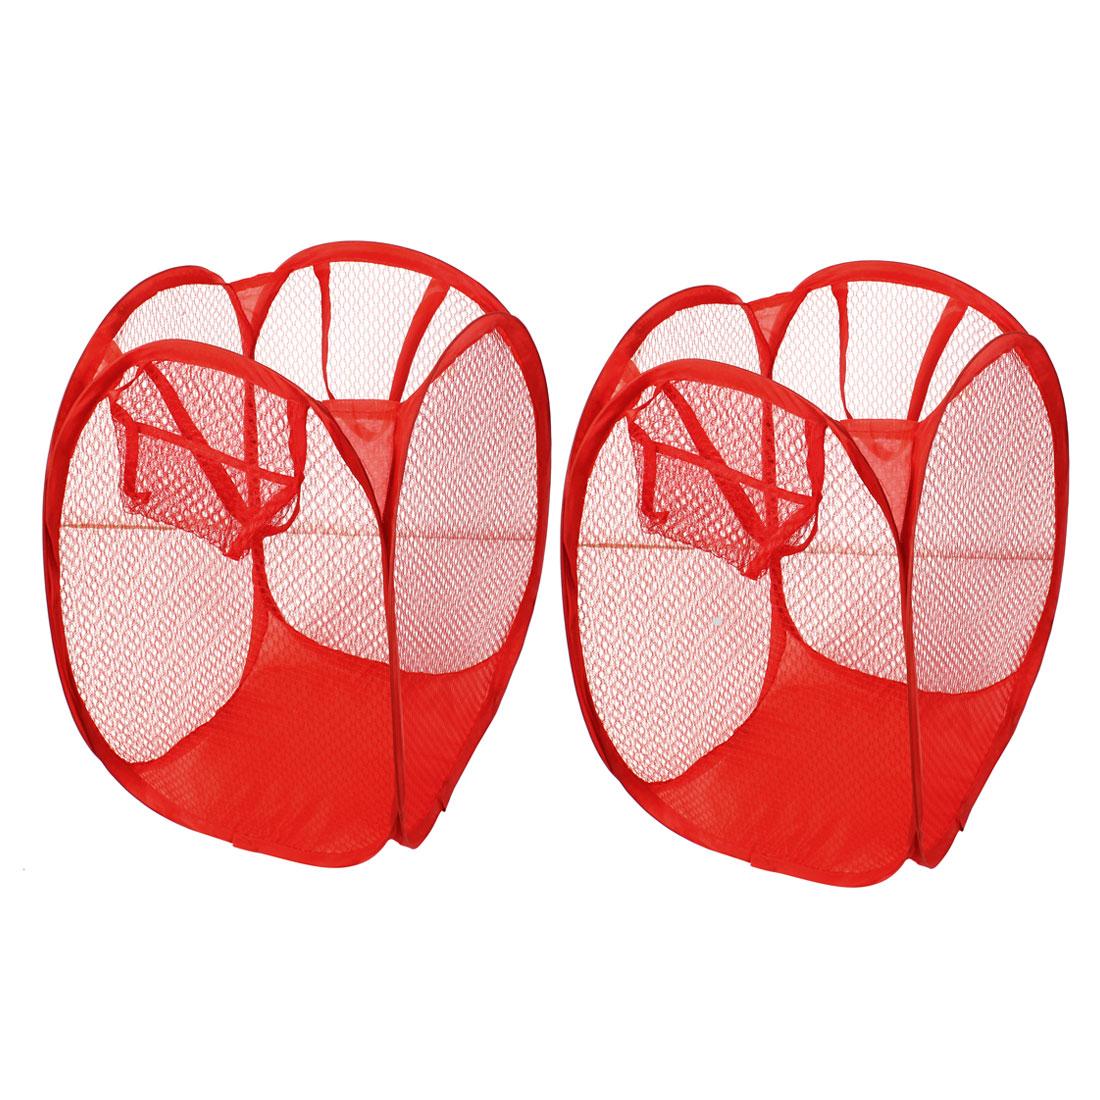 2 Pcs Home Foldable Mesh Nylon Underwear Clothing Washing Bag Red